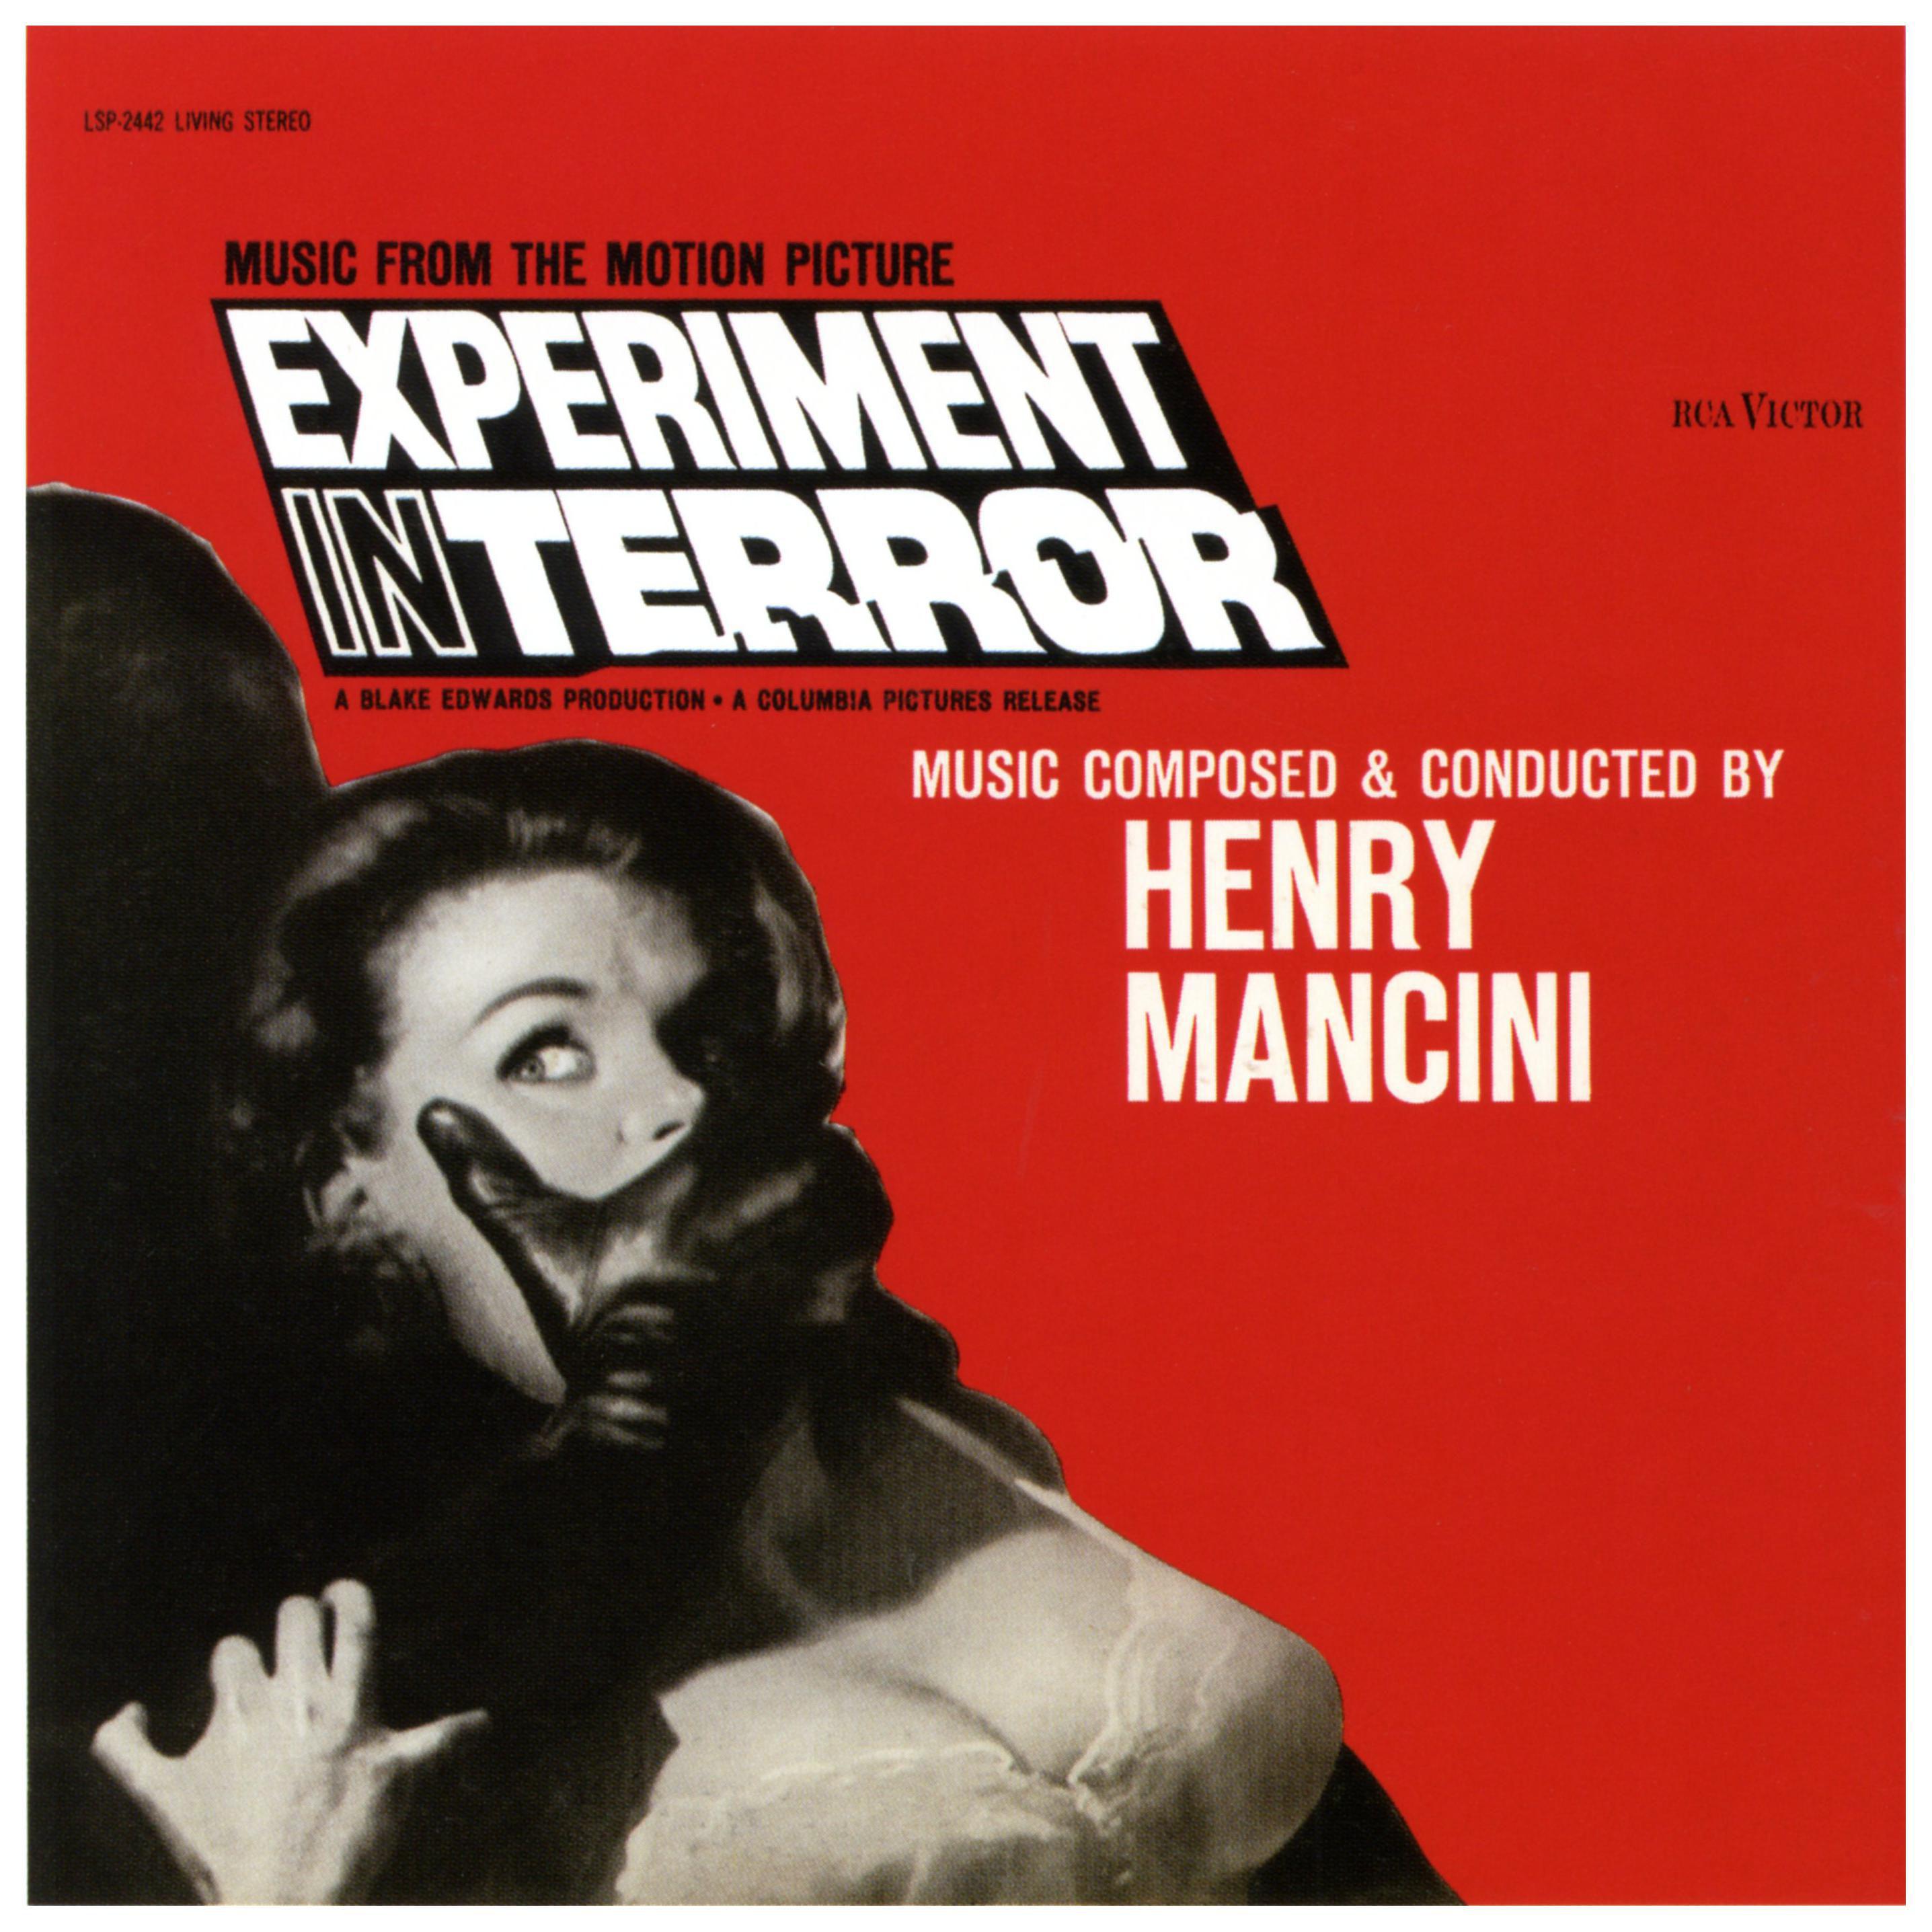 Experiment in Terror (song)